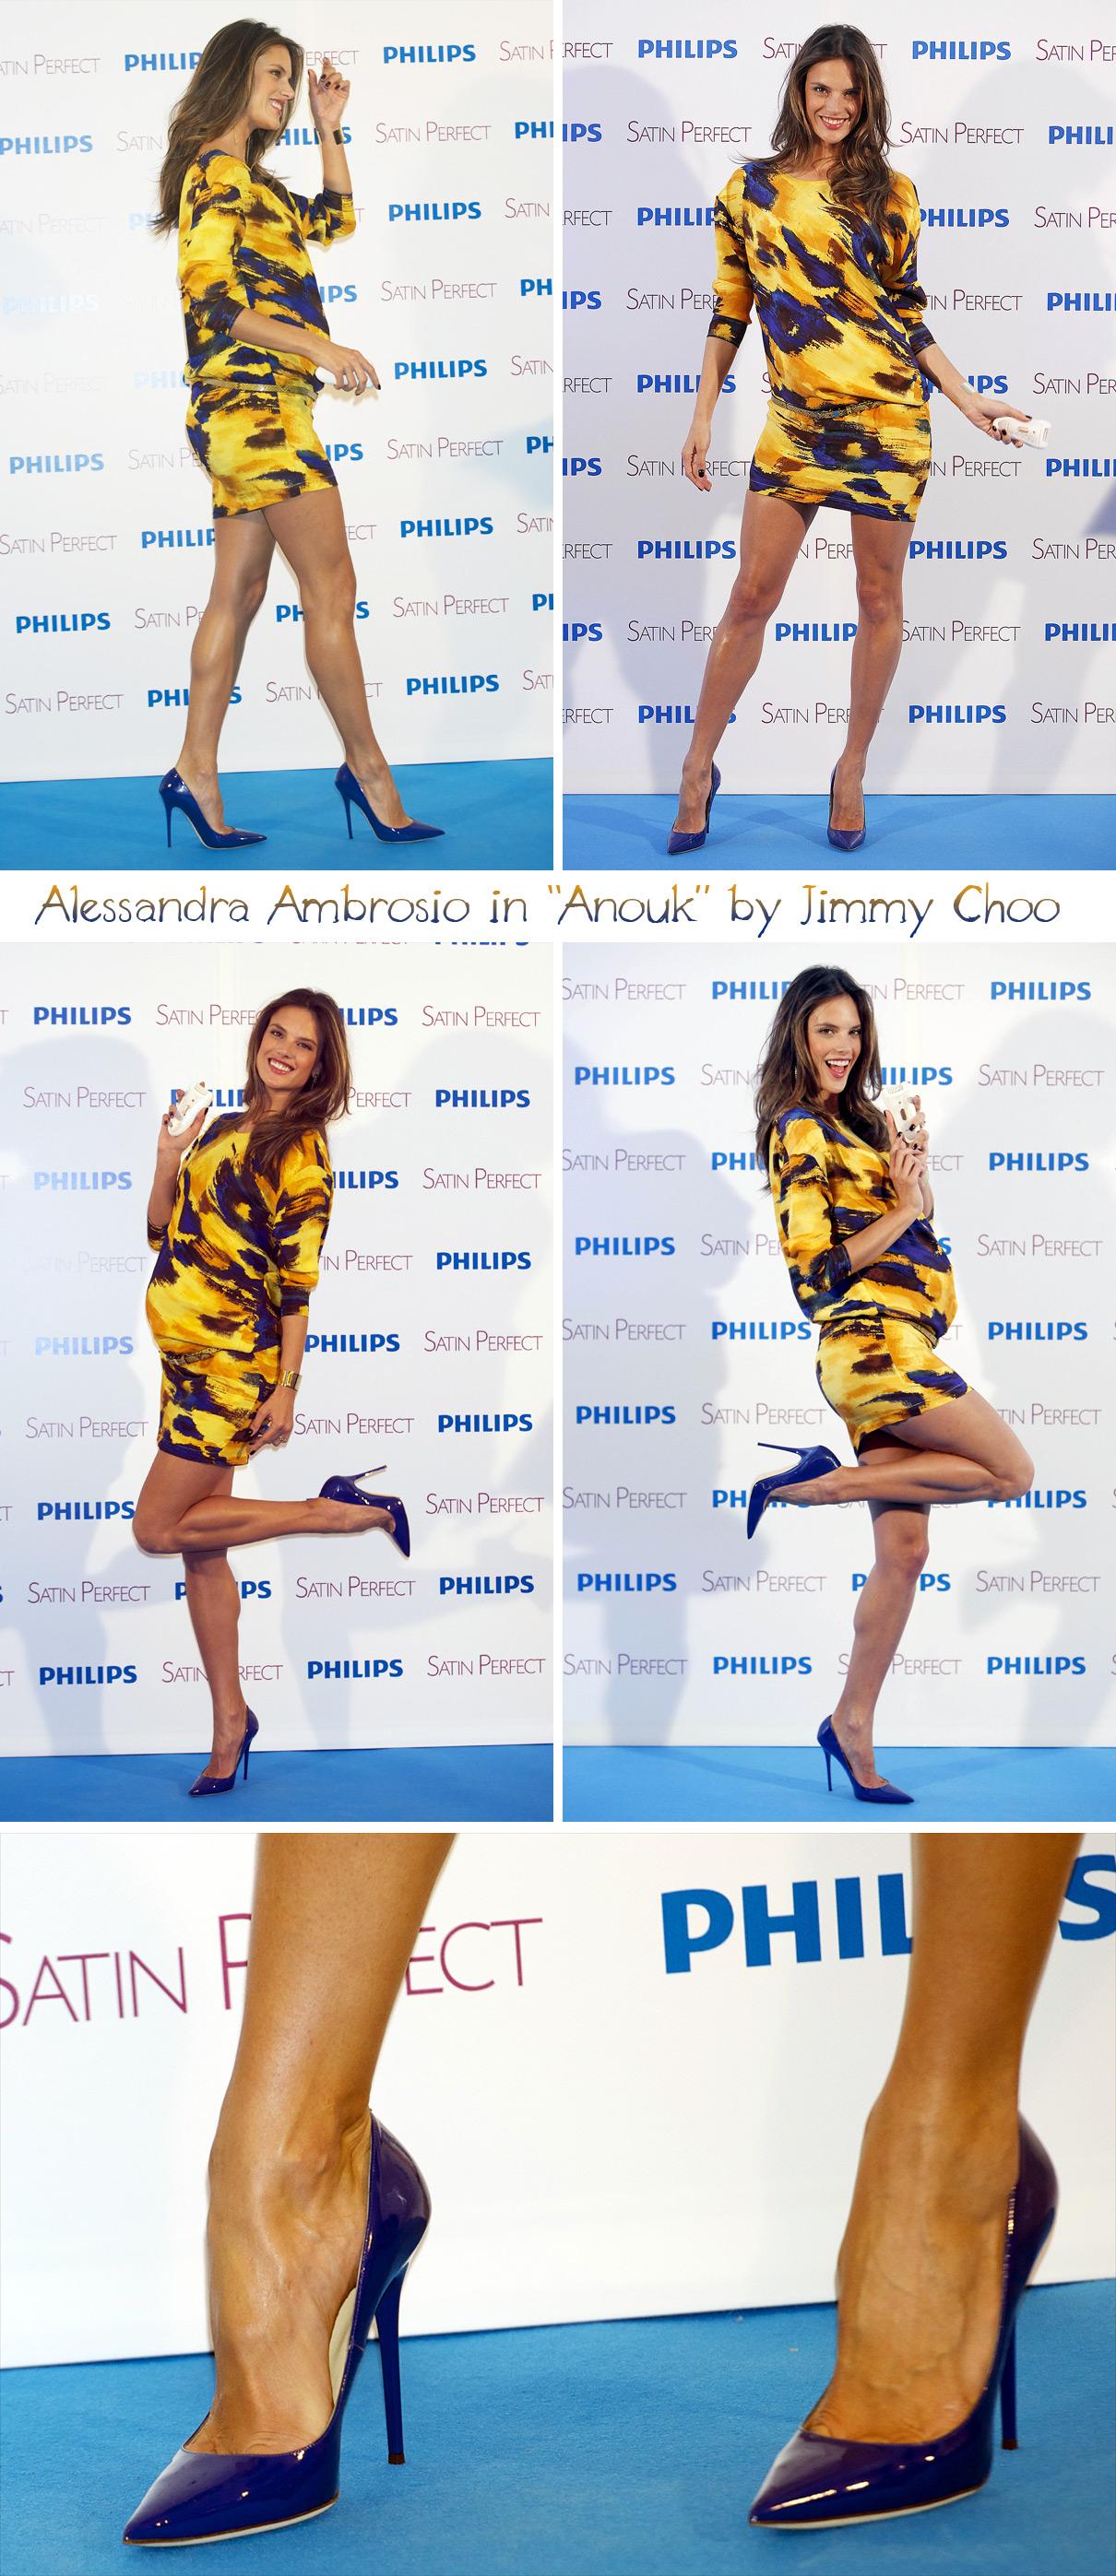 stana katic high heels